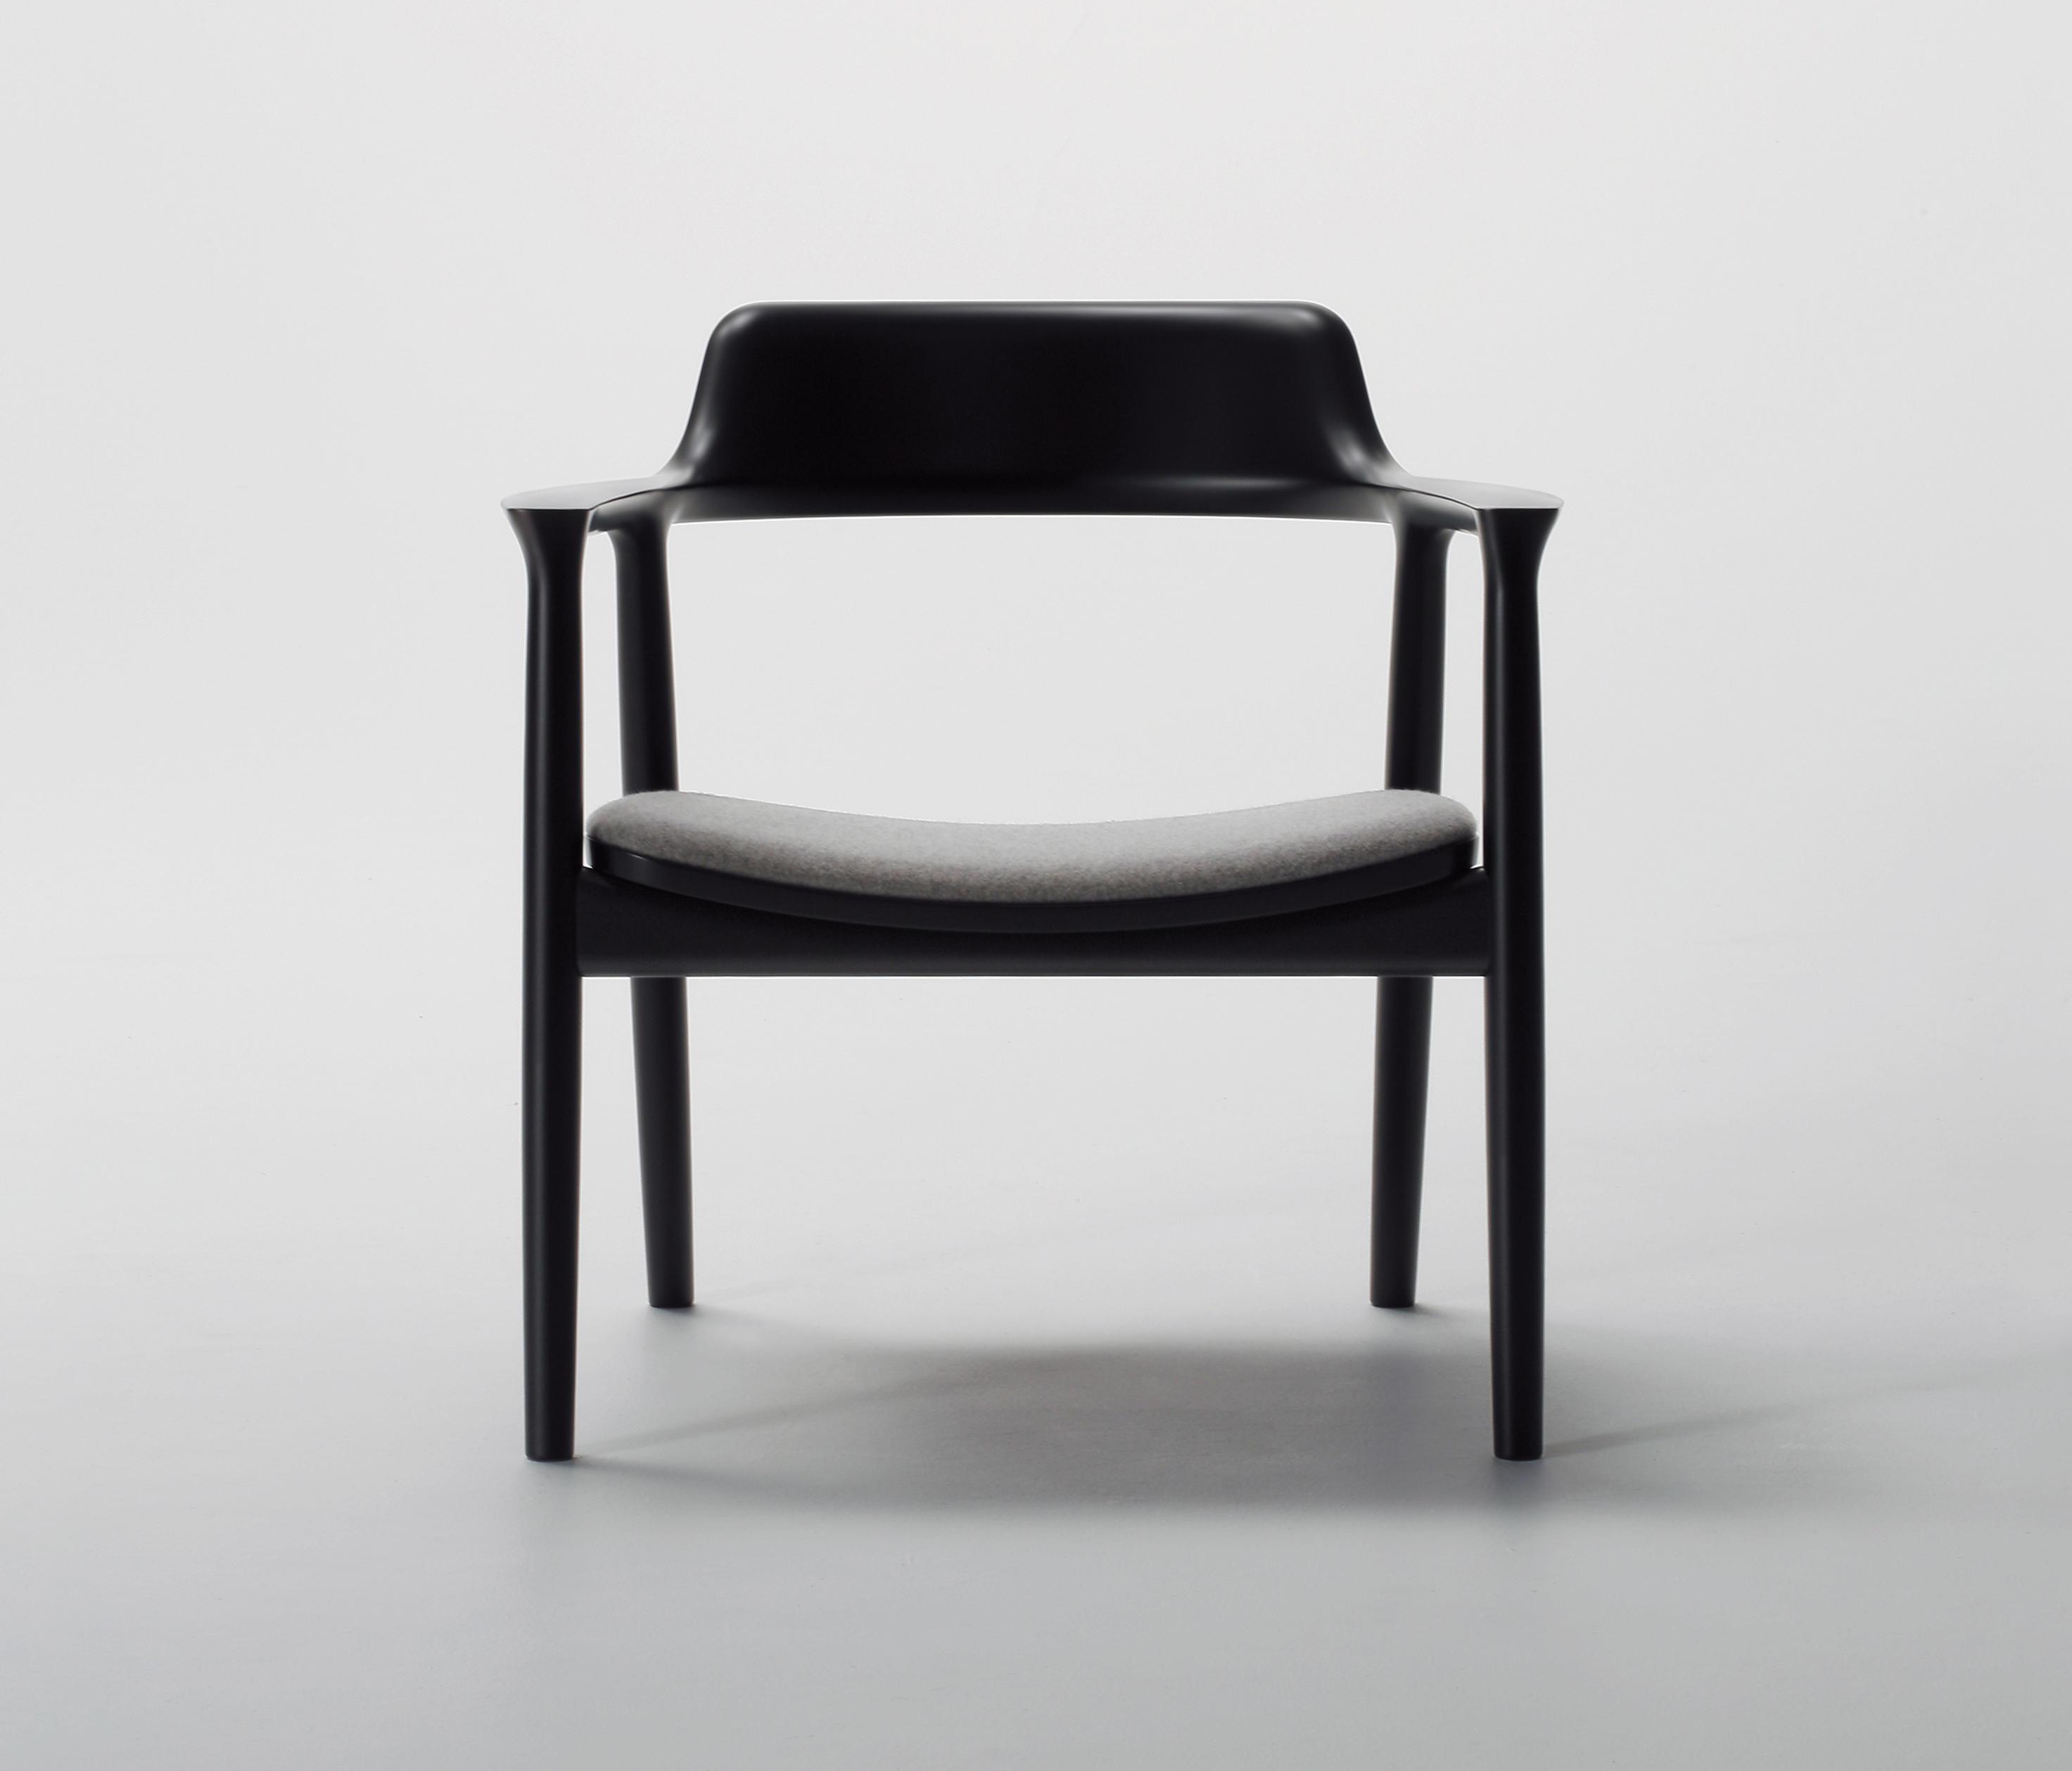 Hiroshima Lounge Chair Armchairs From Maruni Architonic